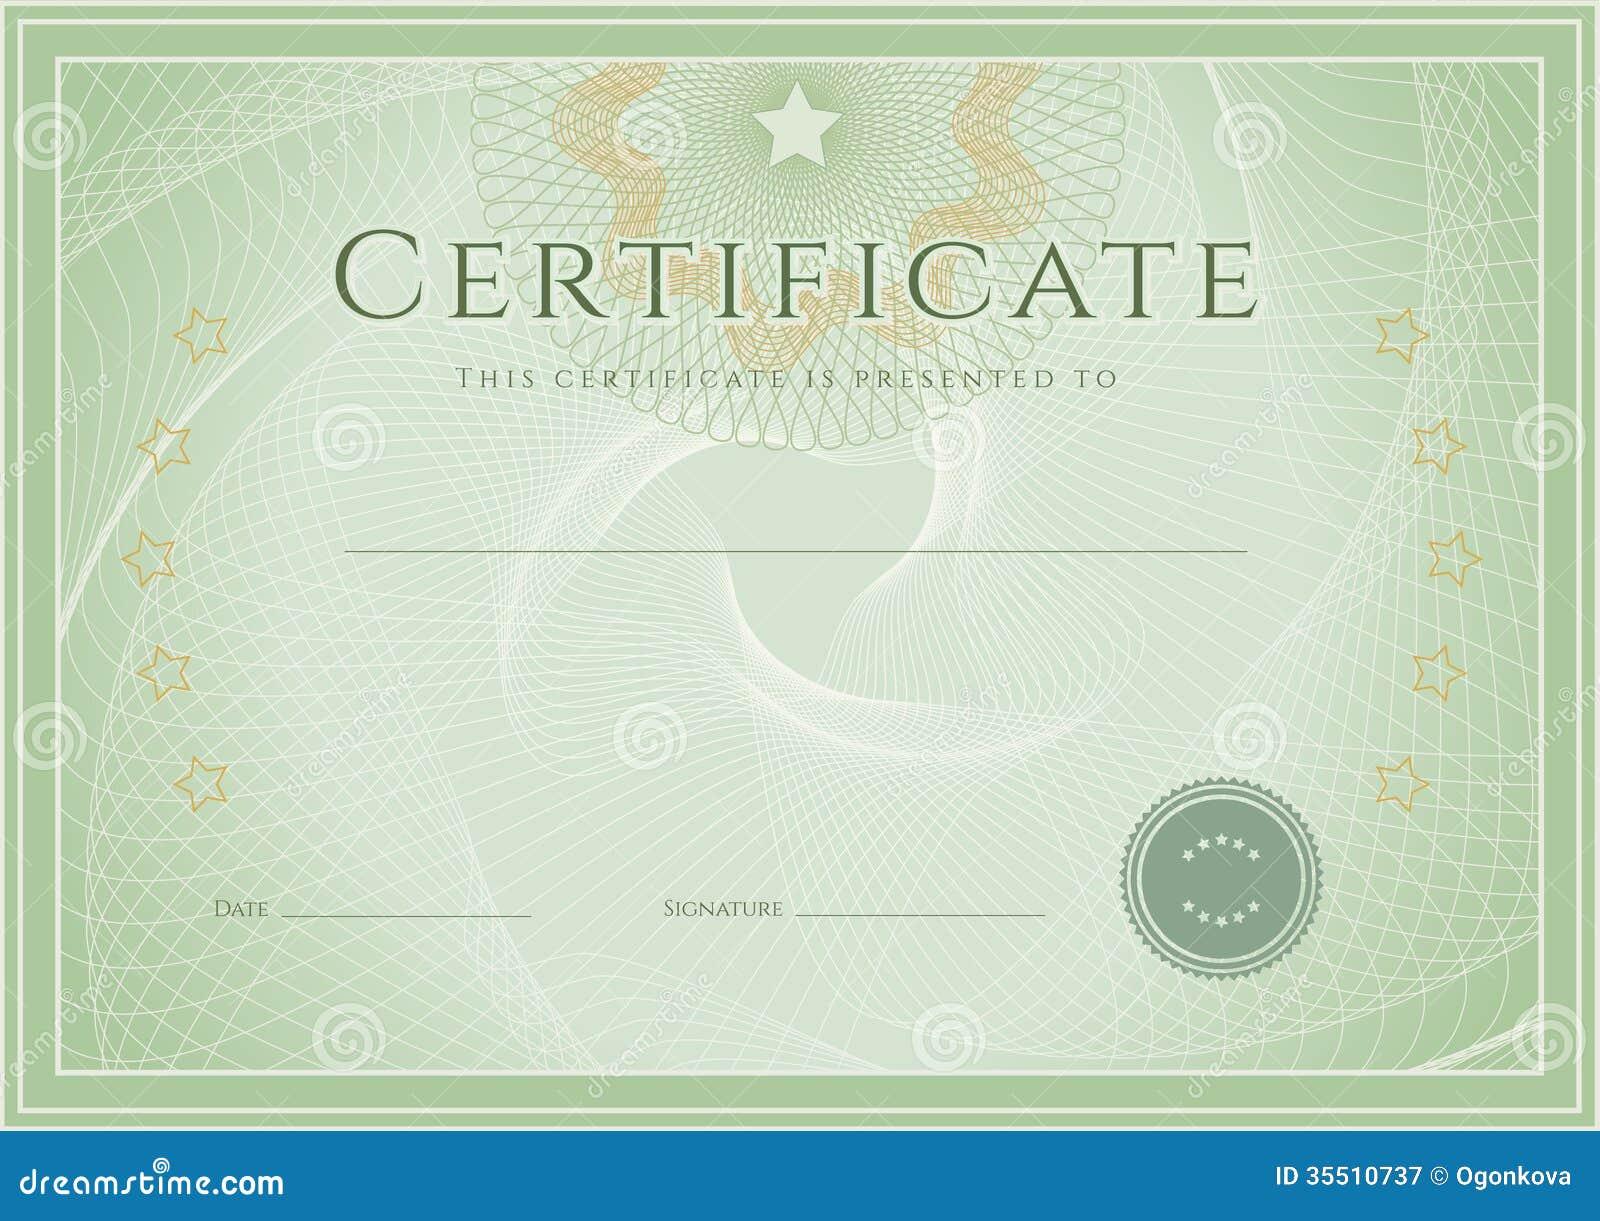 Zertifikat-/Diplompreisschablone. Schmutz Patte Vektor Abbildung ...